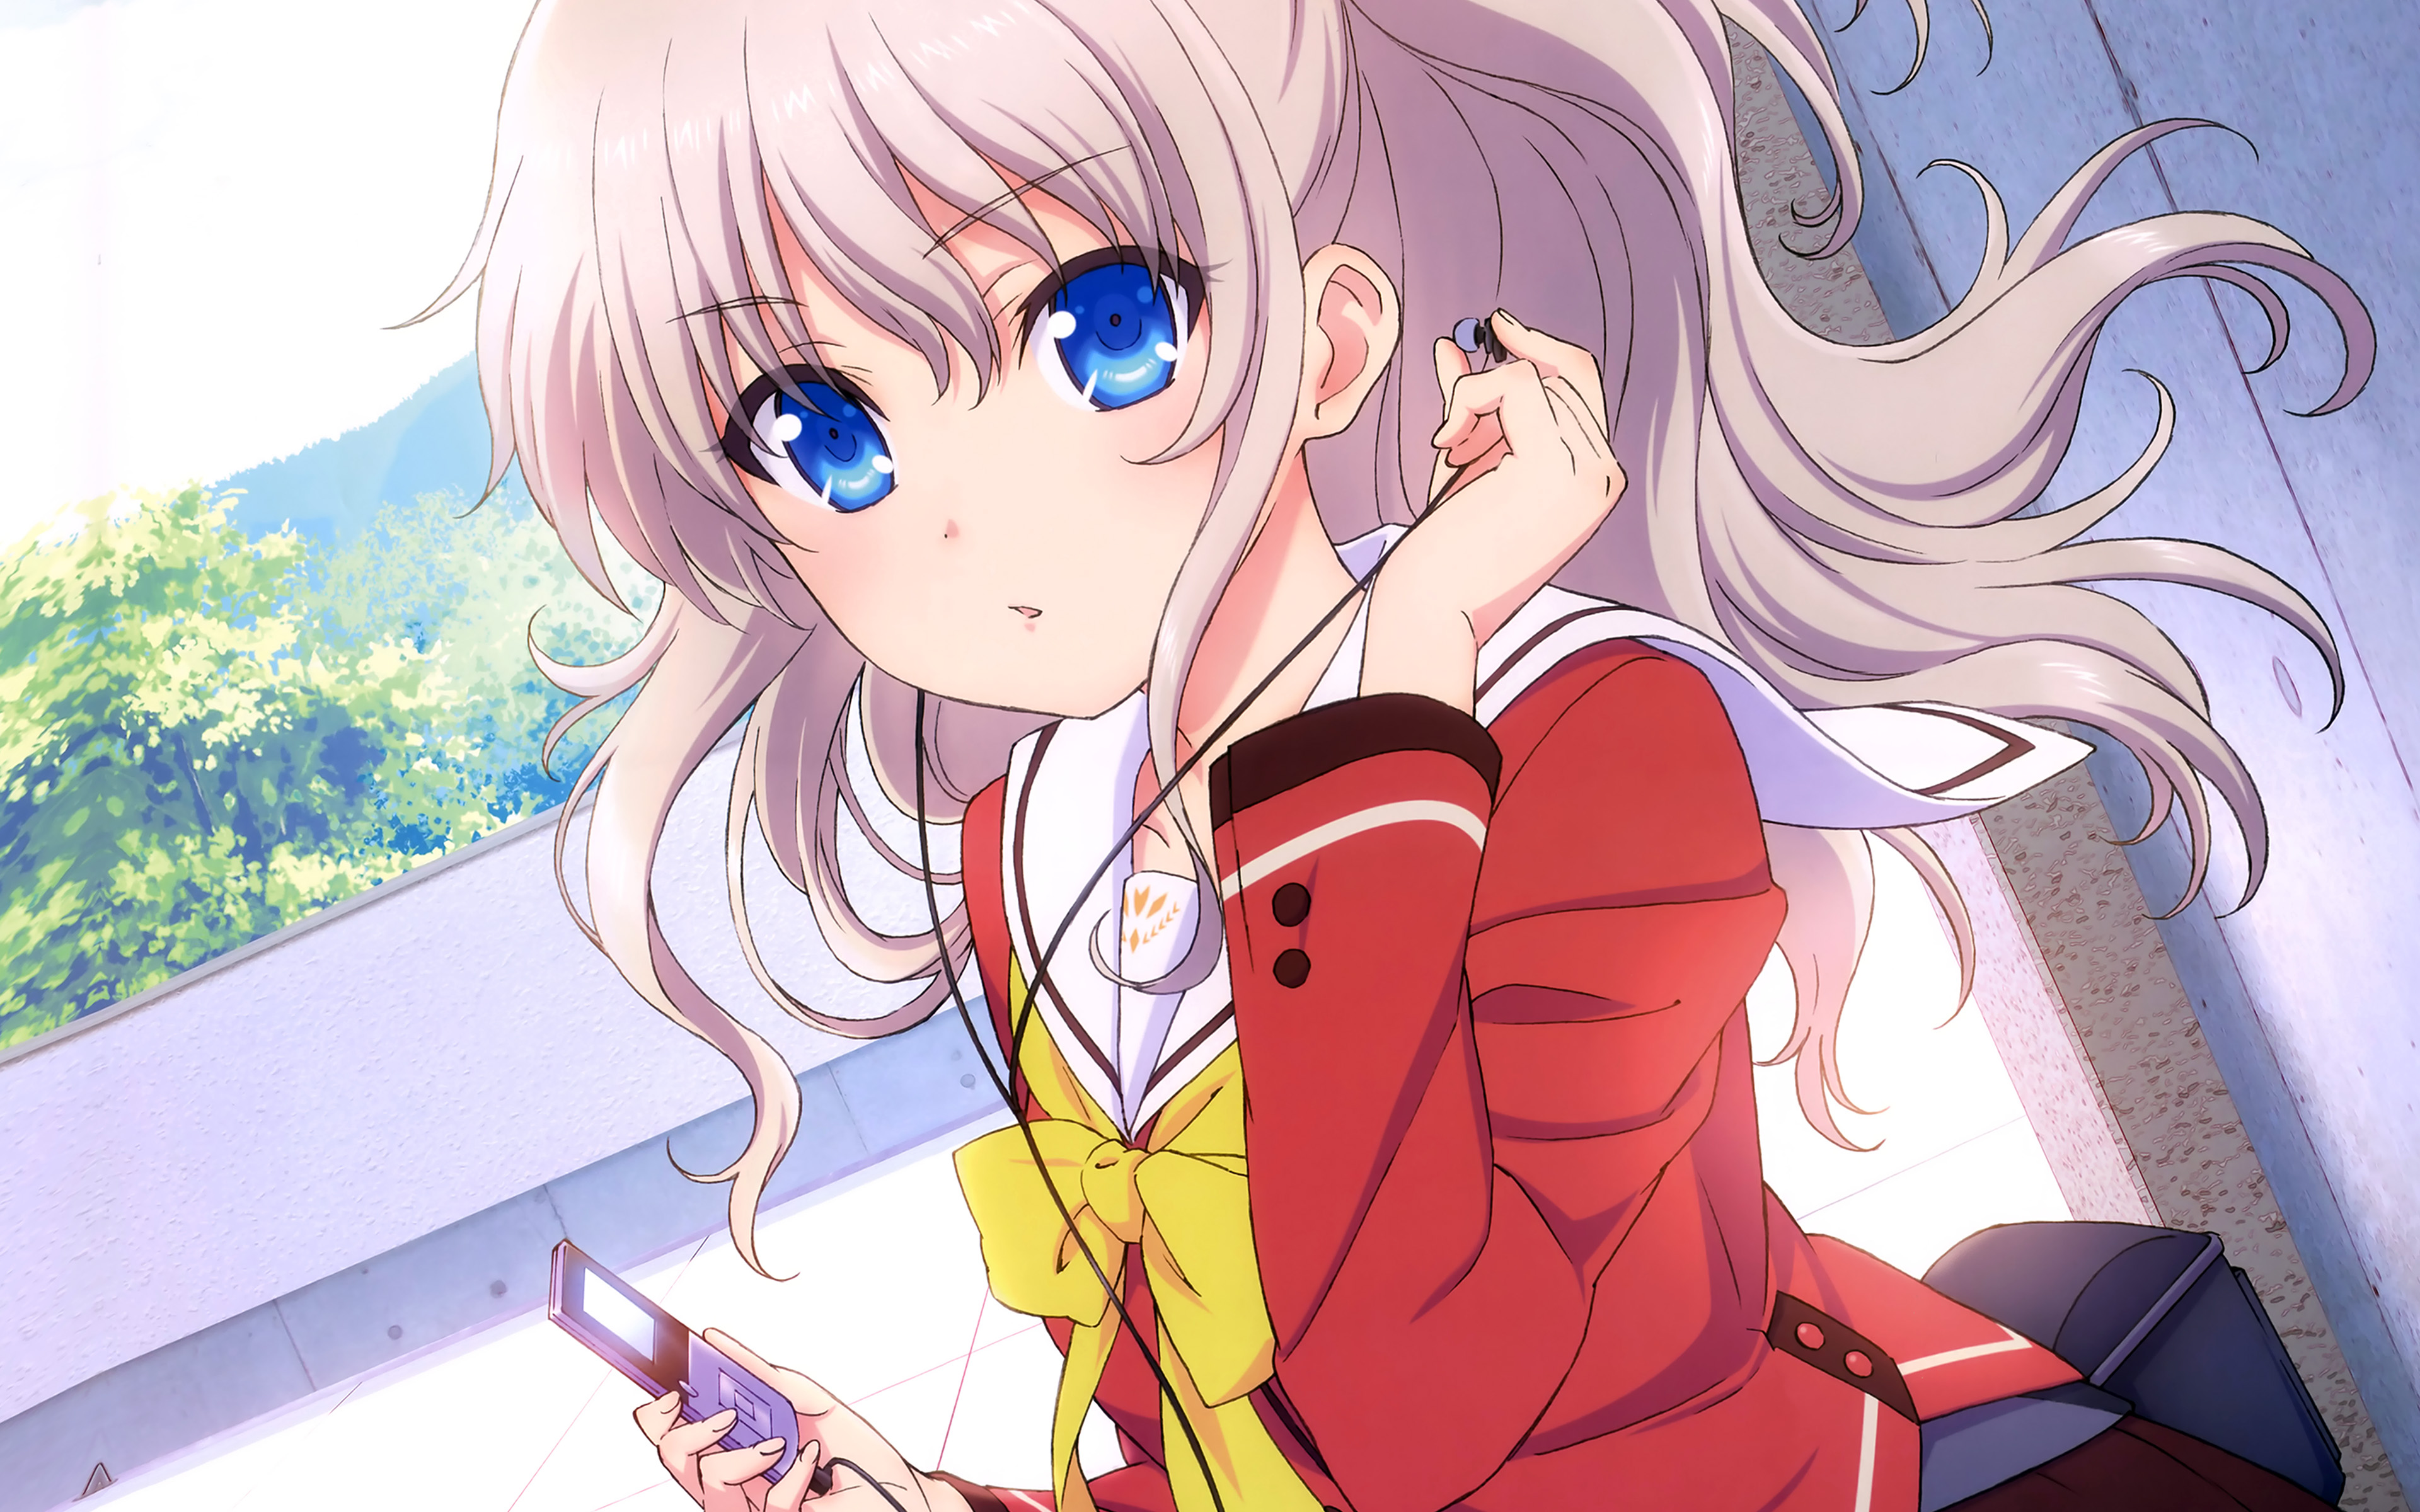 Aq87-chalorette-anime-girl-cute-art-illustration-wallpaper